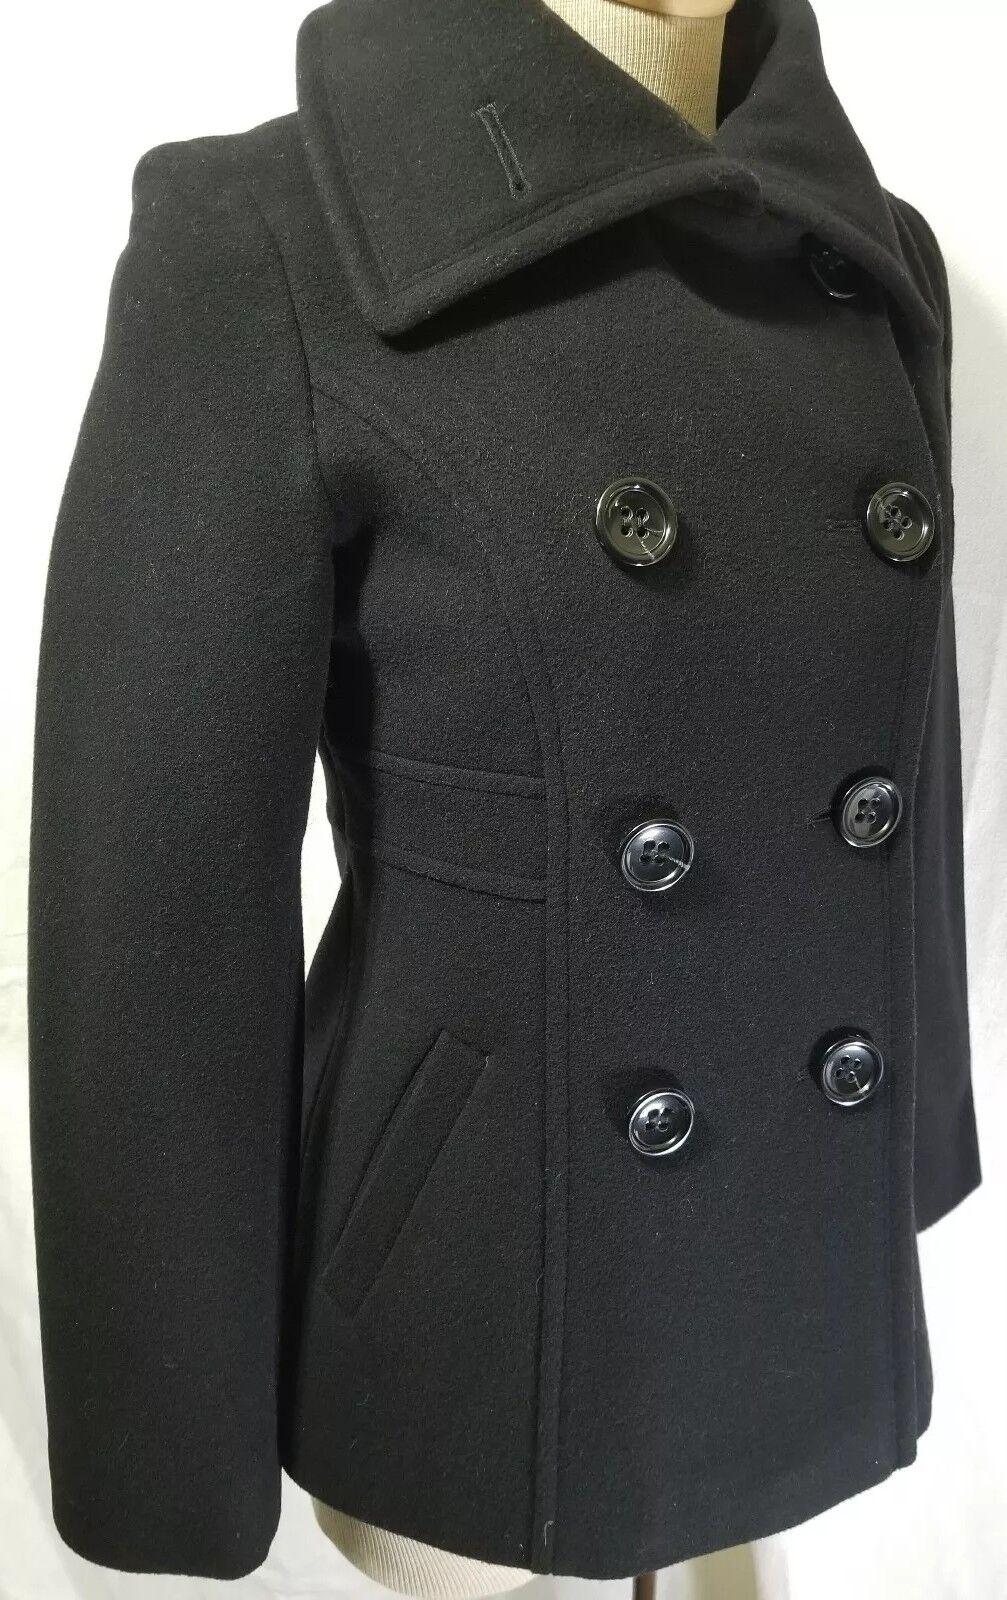 DKNY Women's Wool Blend Peacoat Size 4 Military Double Breasted women Karan NY